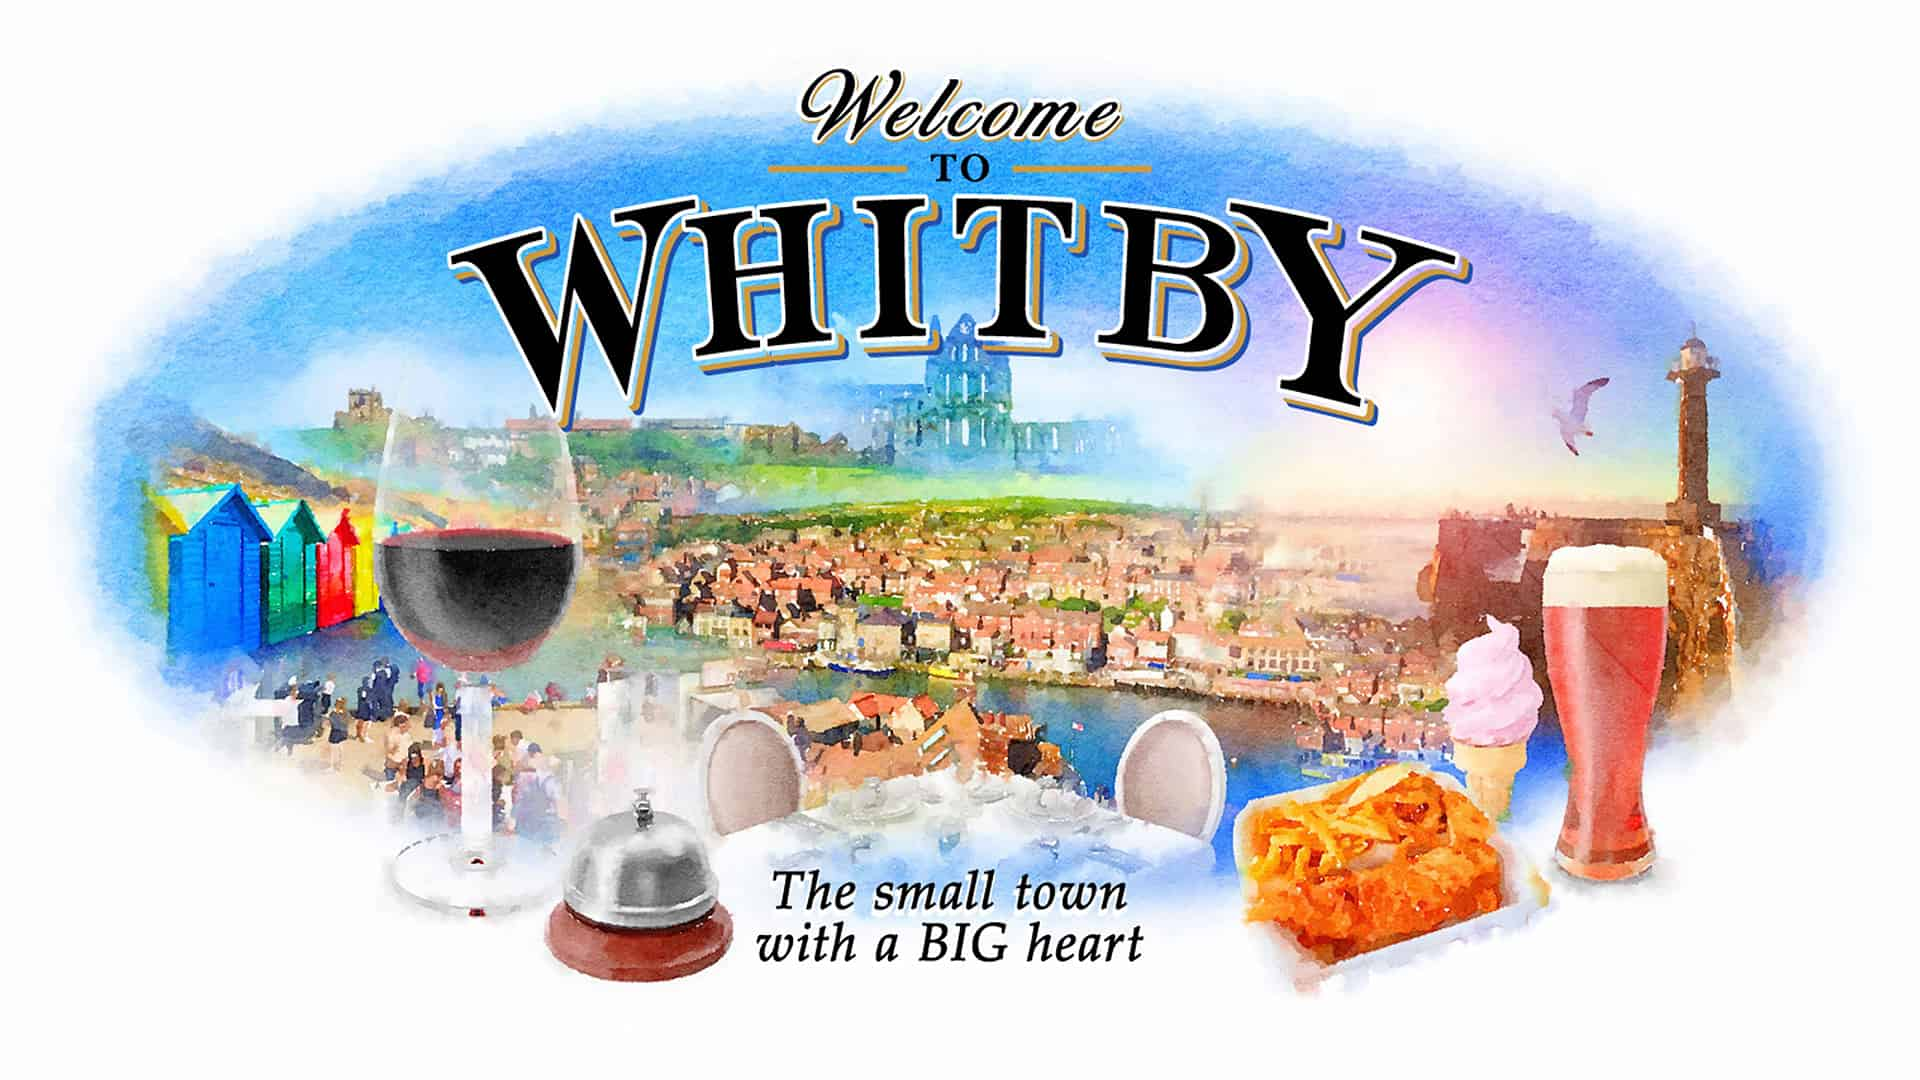 Whitby Image 1